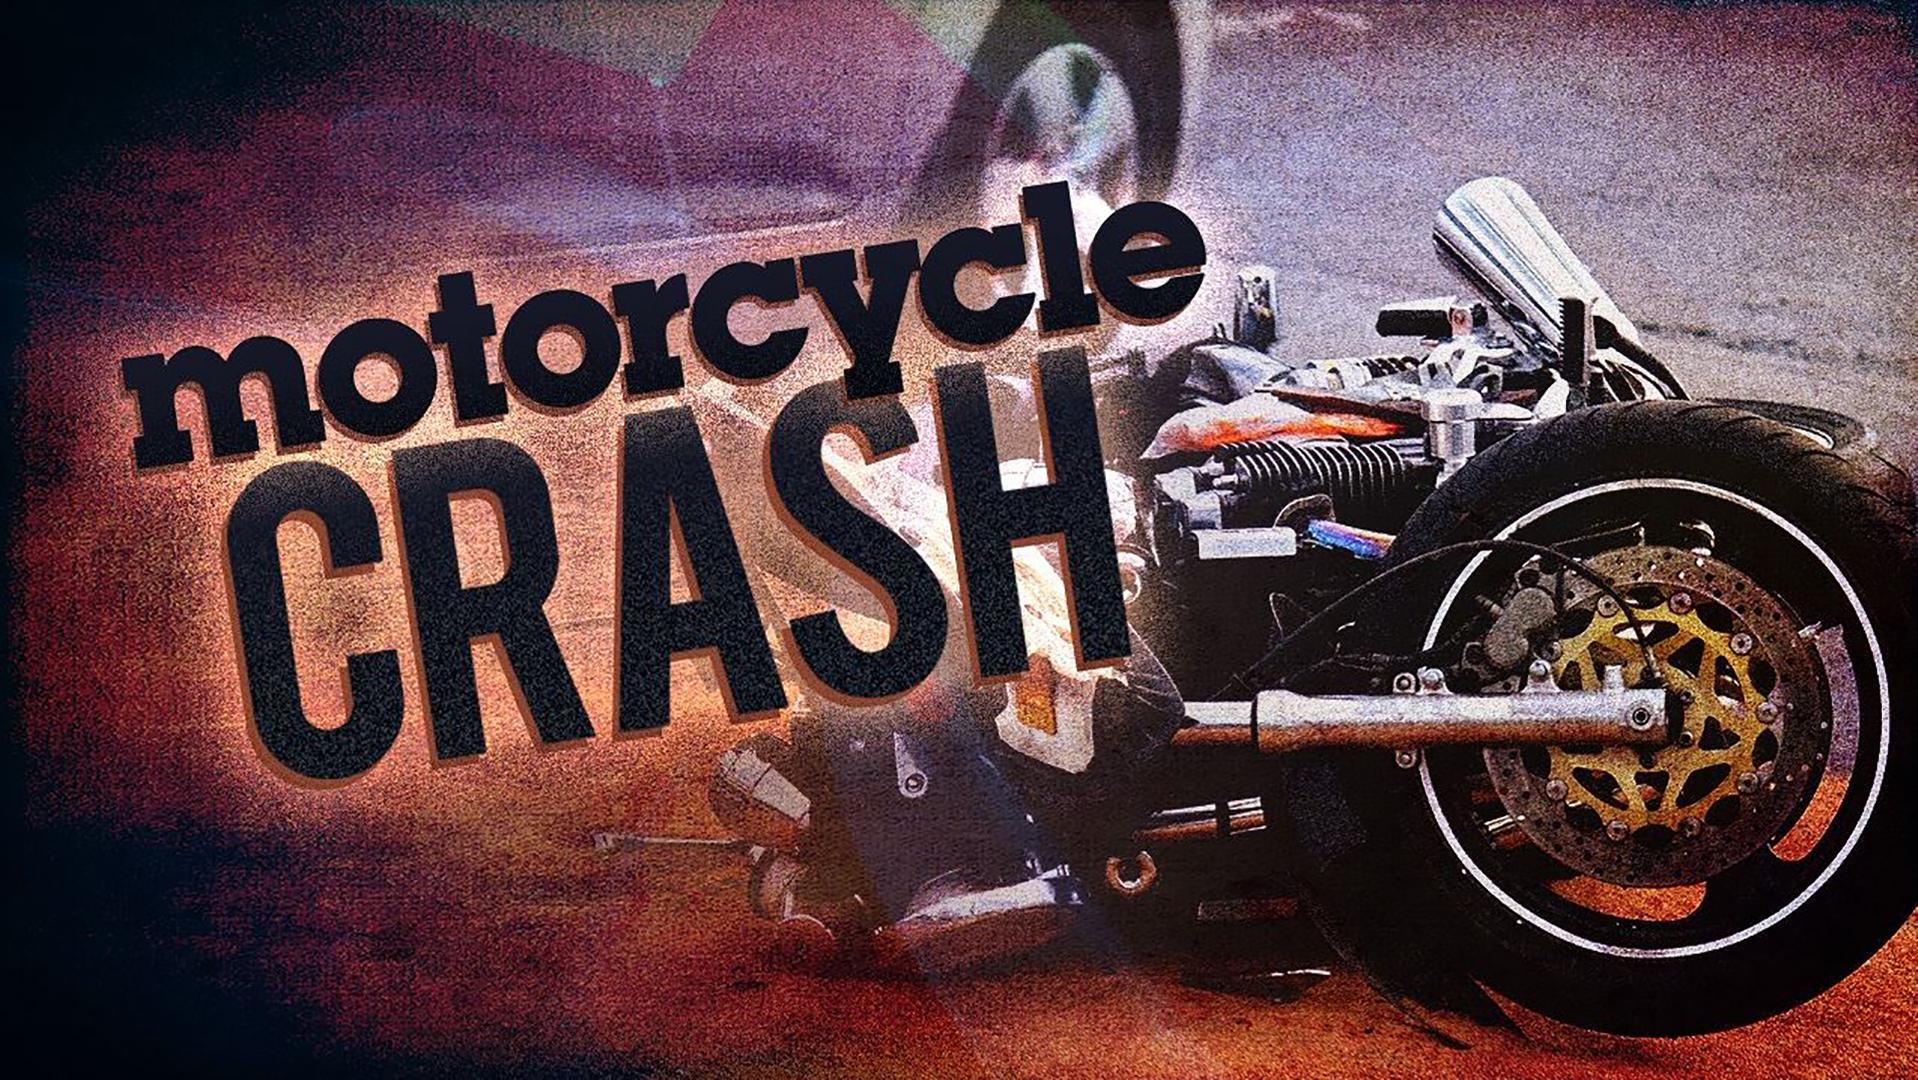 Motorcycle_Crash_Generic_1526836908742.jpg